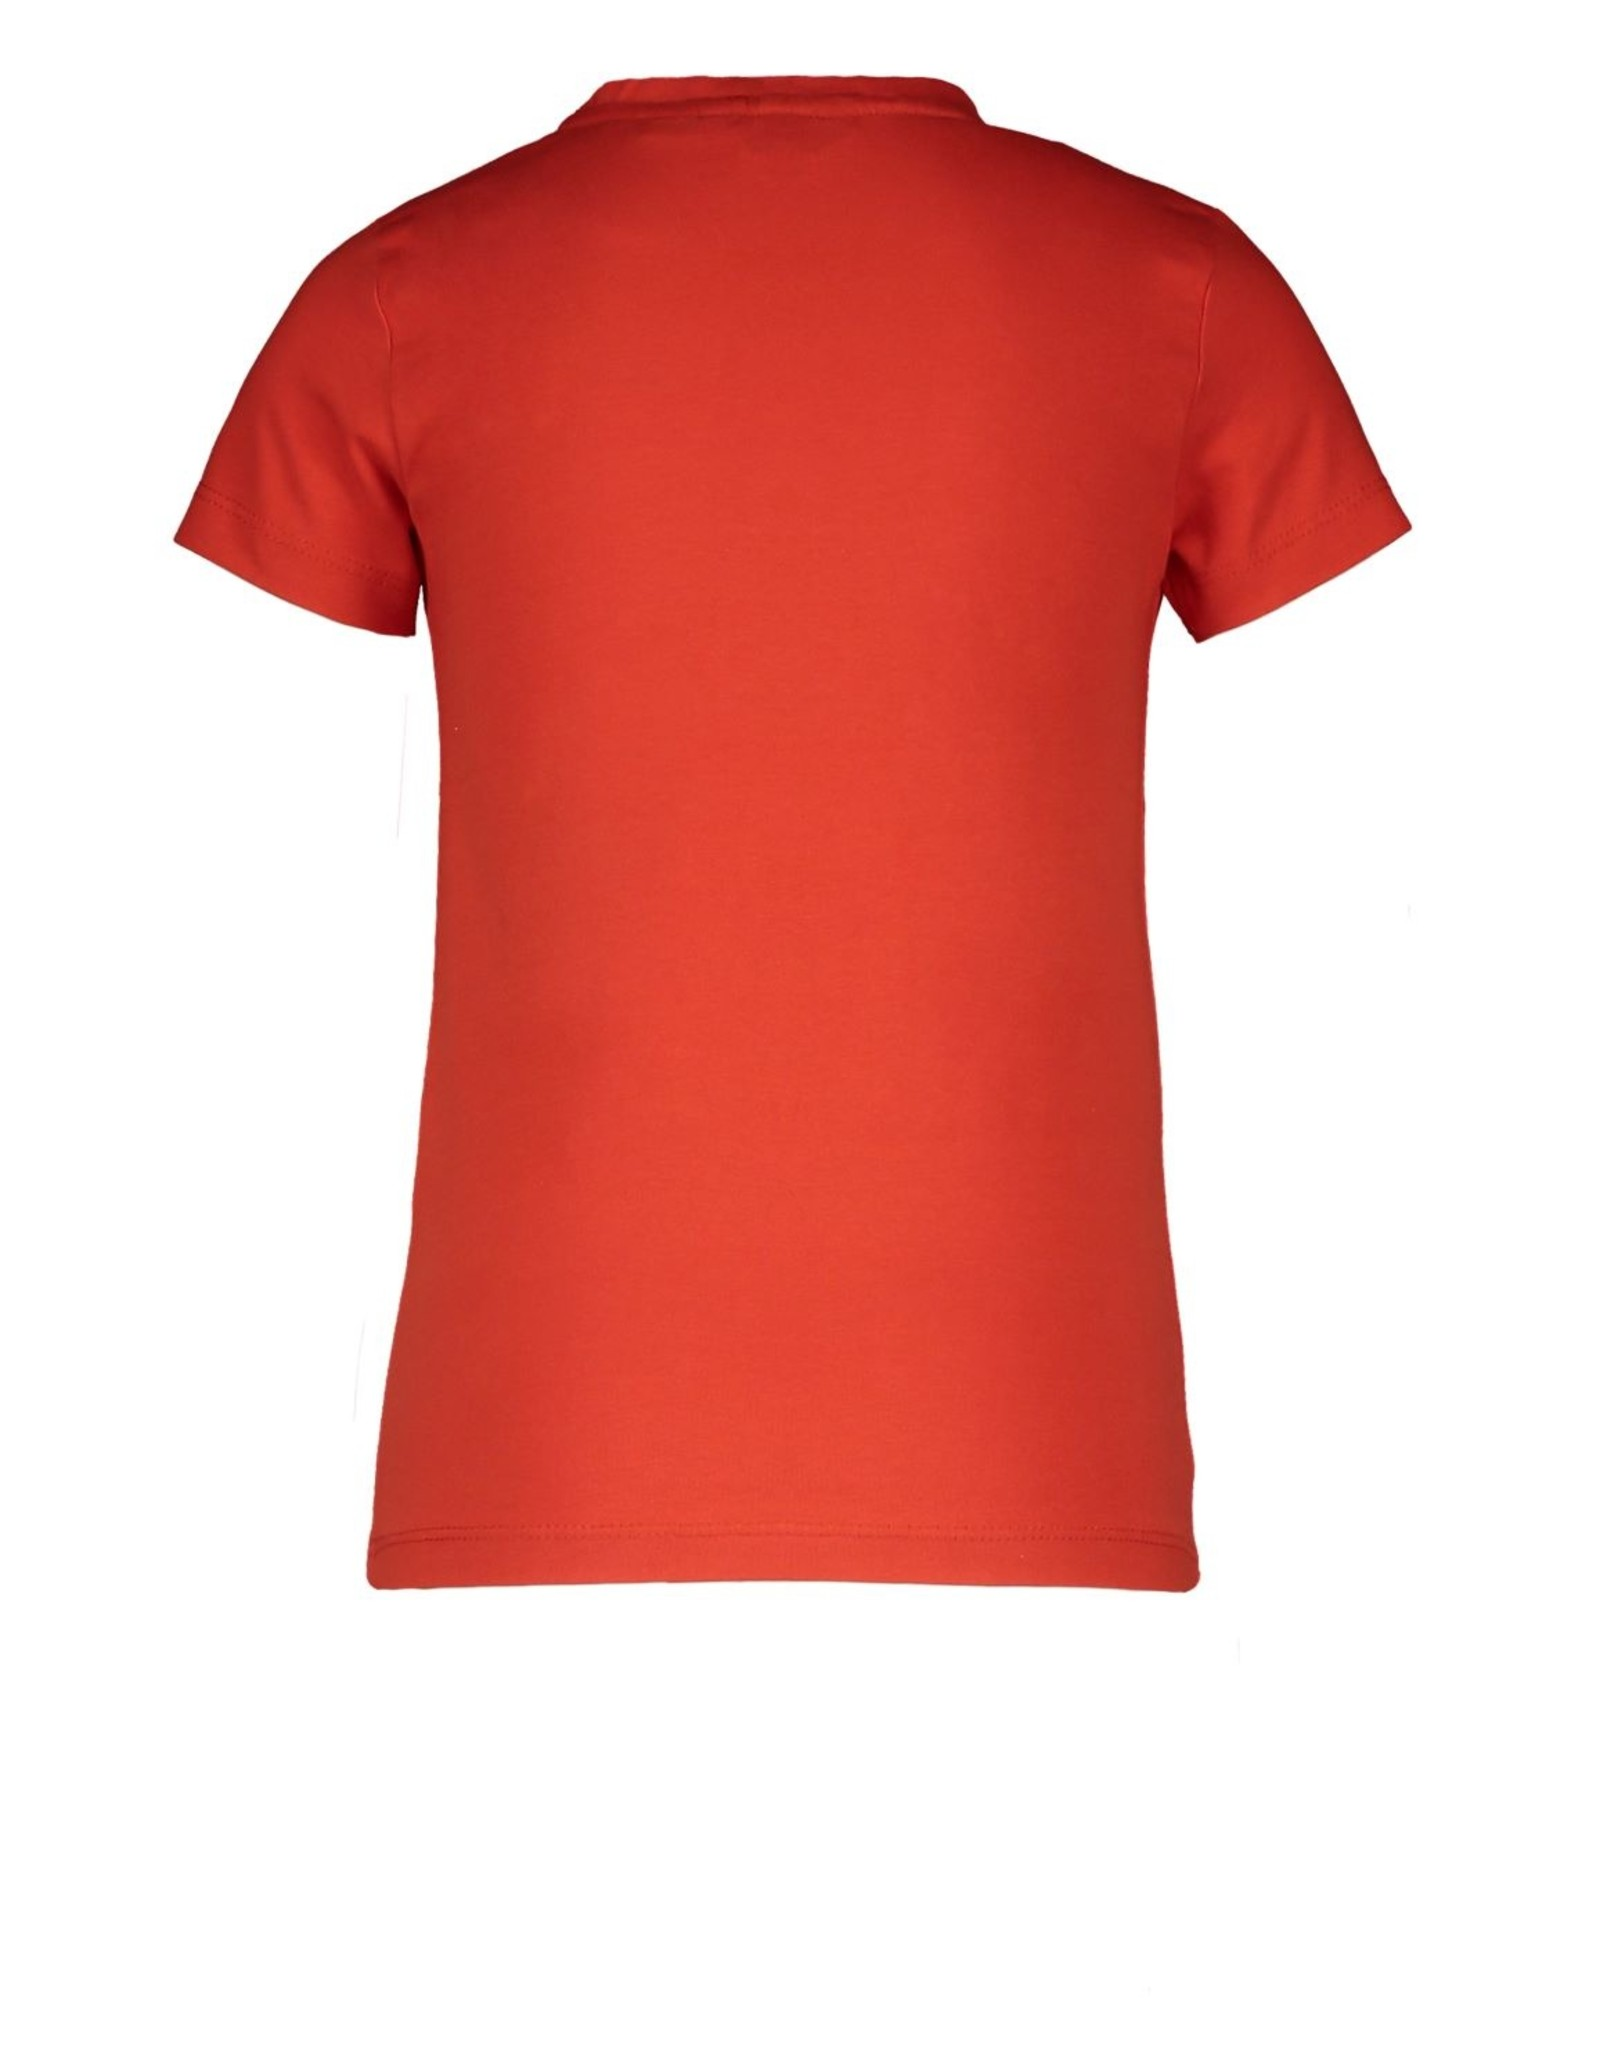 Moodstreet Moodstreet shirt 5401 red